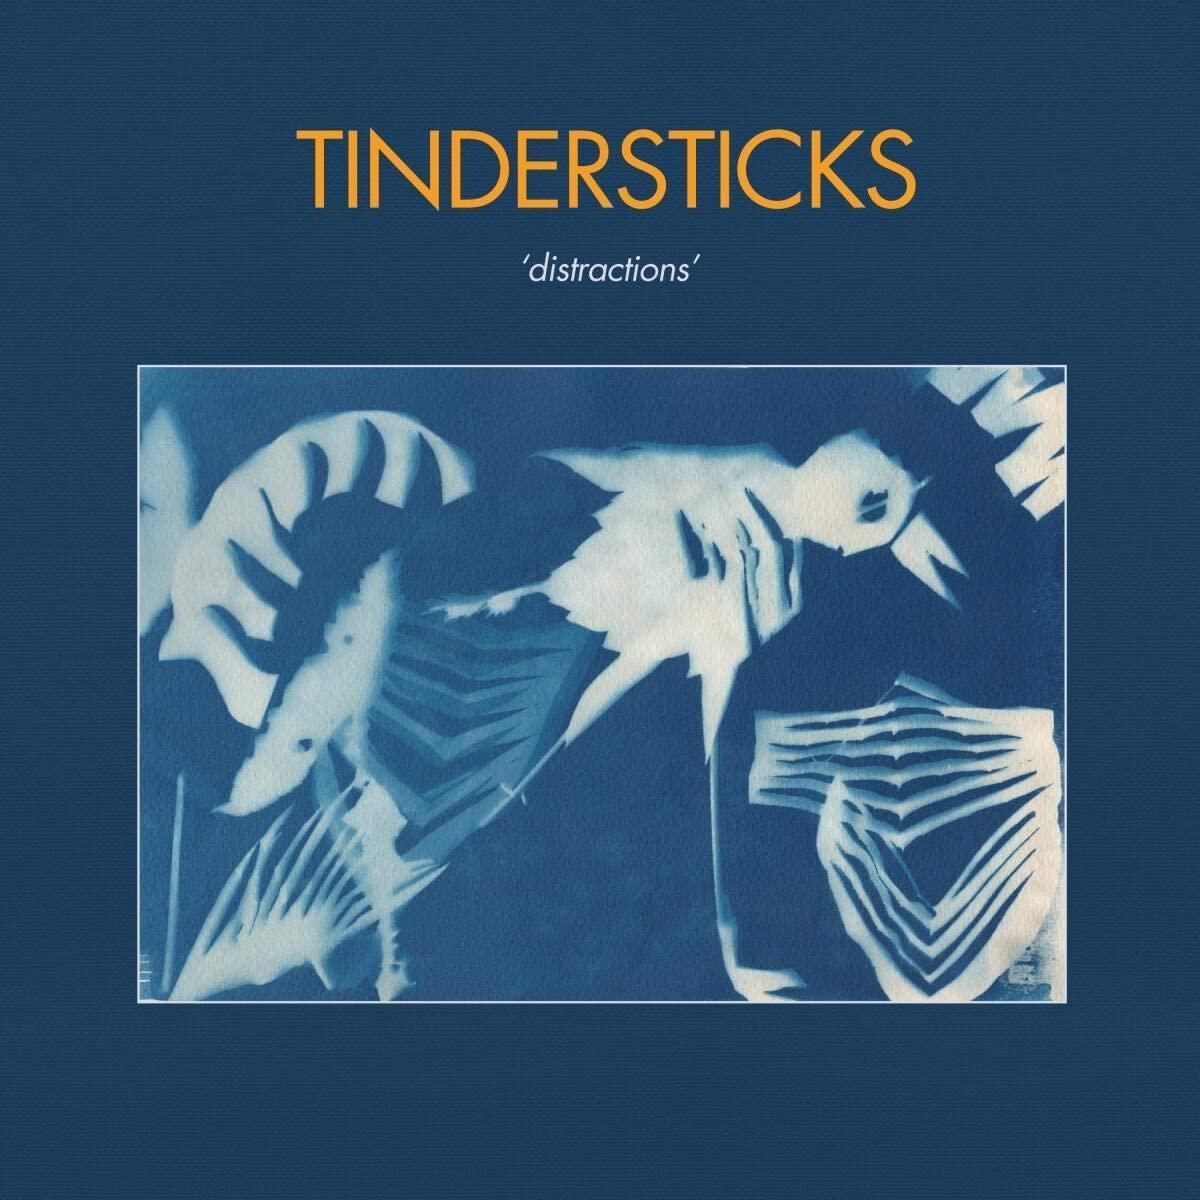 Tindersticks - Distractions [LTD LP] (Blue Vinyl)